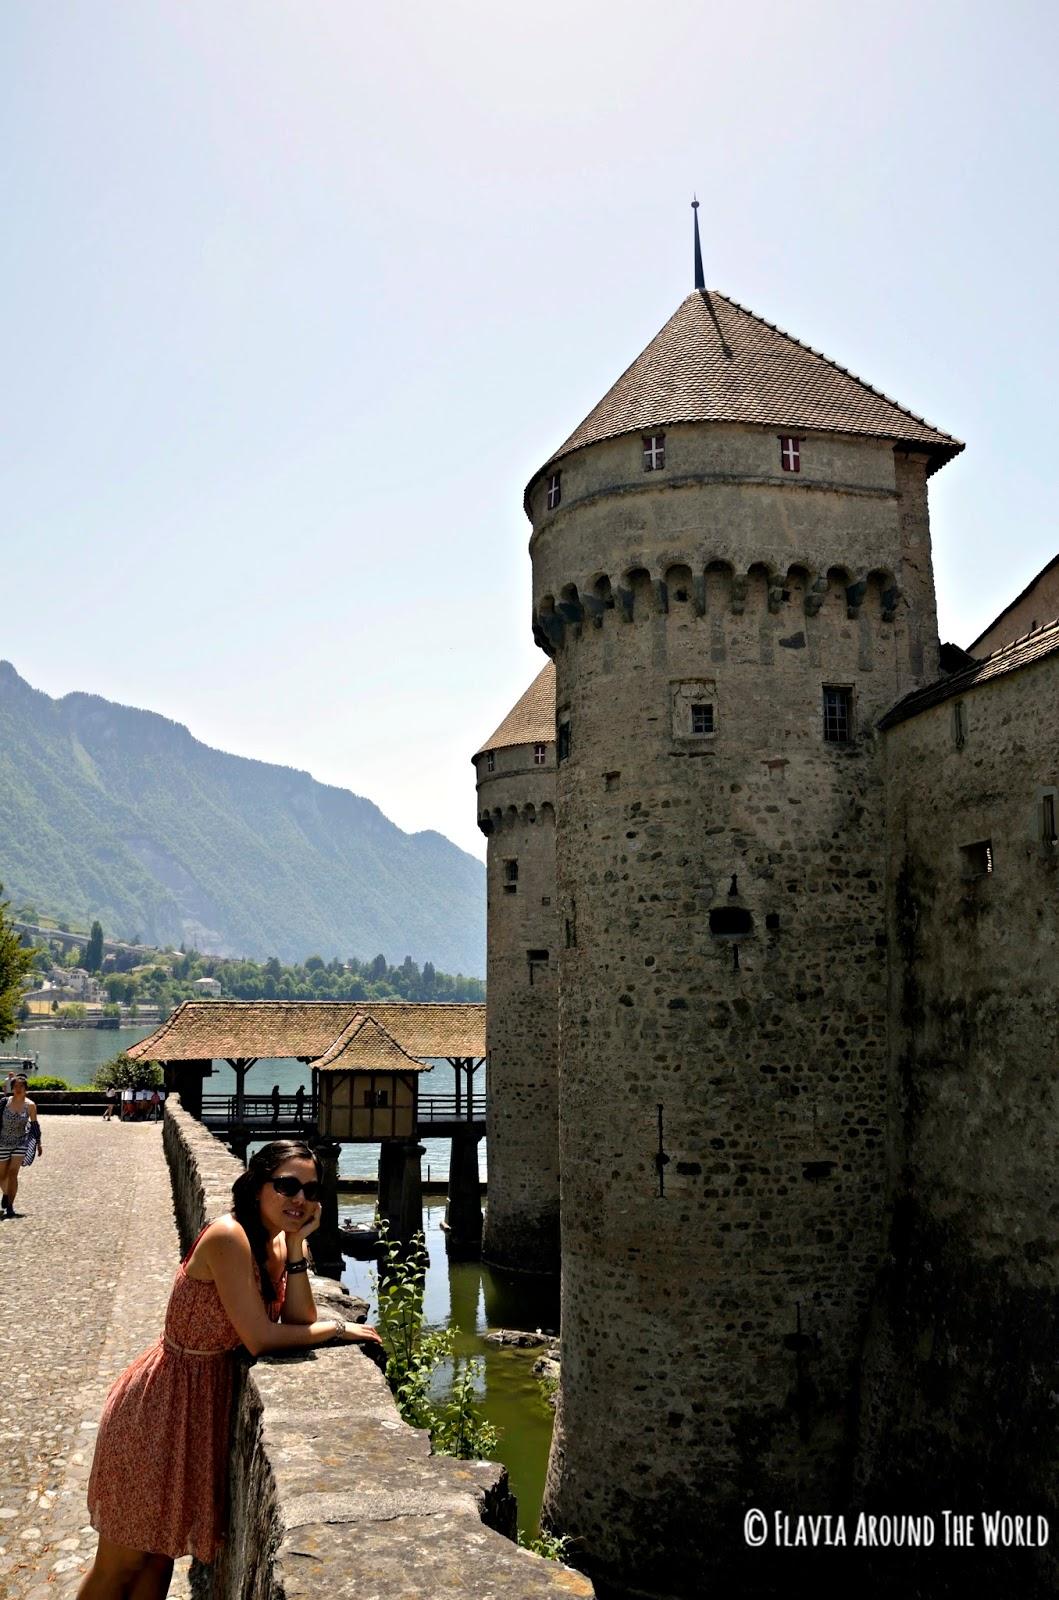 Alrededor del castillo de Chillon, Suiza